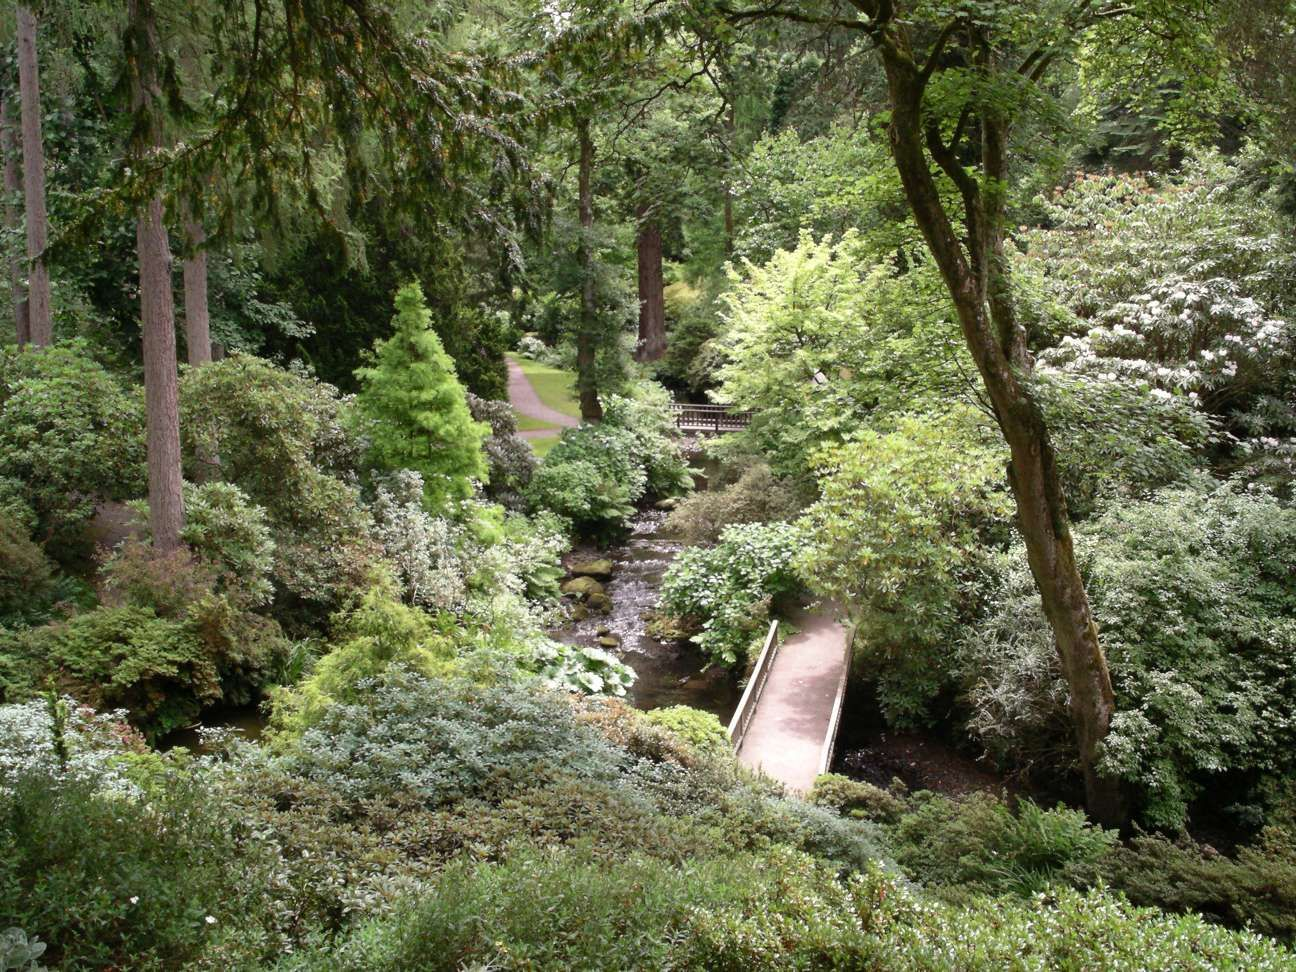 A Woodland Garden At Bodnant Garden, Near Conwy, Wales, UK. Photo Taken By  Wikipedia User Velela.